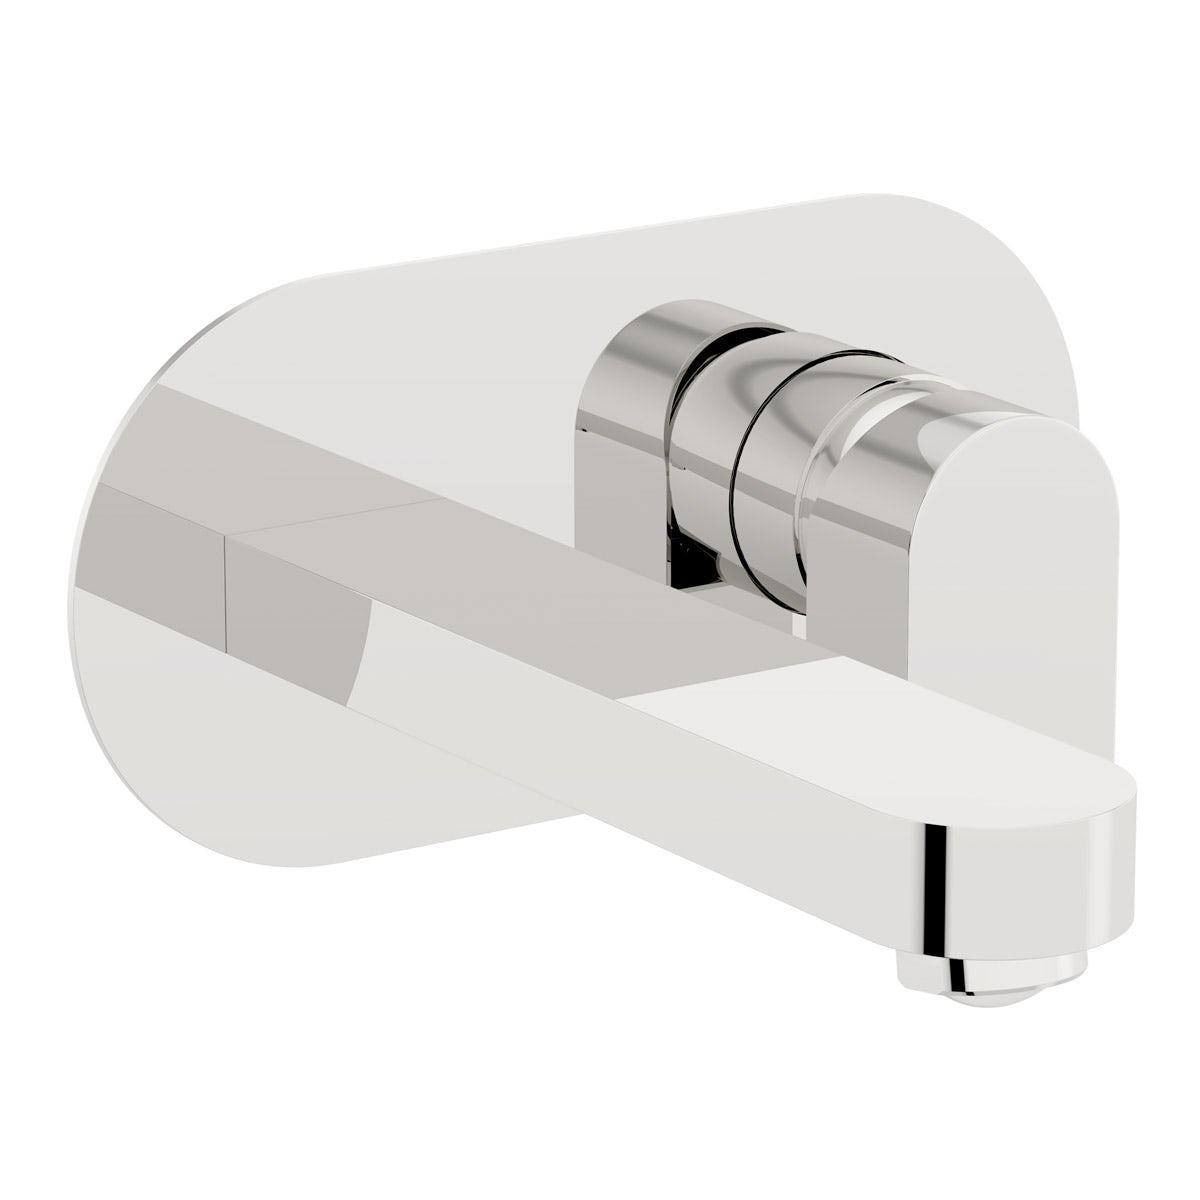 Erith wall mounted bath mixer tap